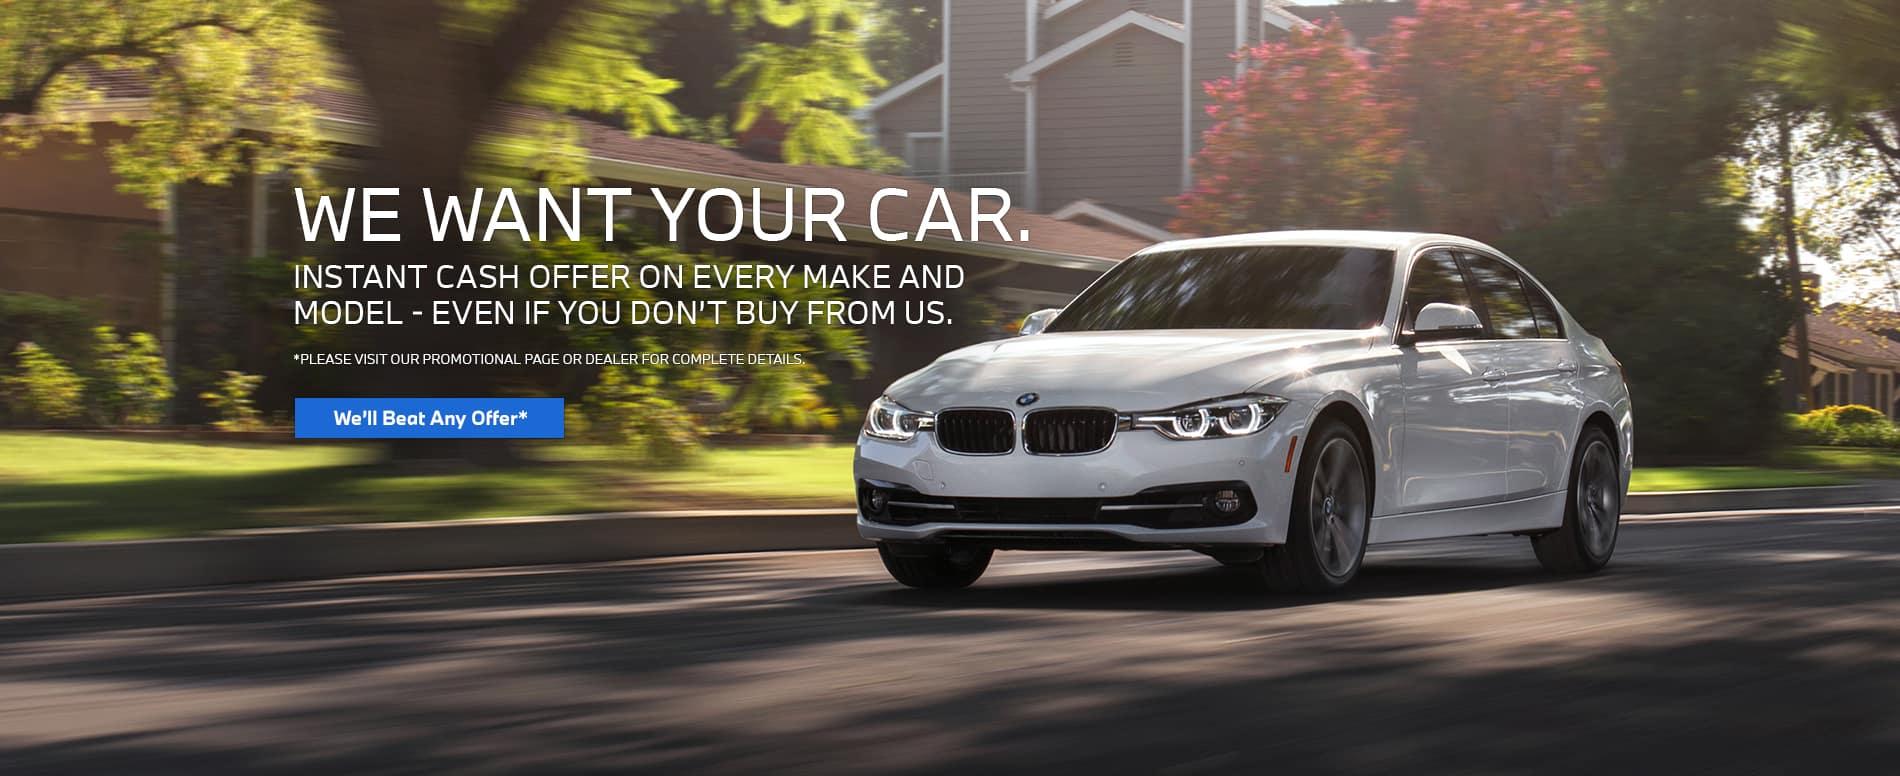 BMW-WWYC-Homepage-Banner-Desktop-1900×776 (1)